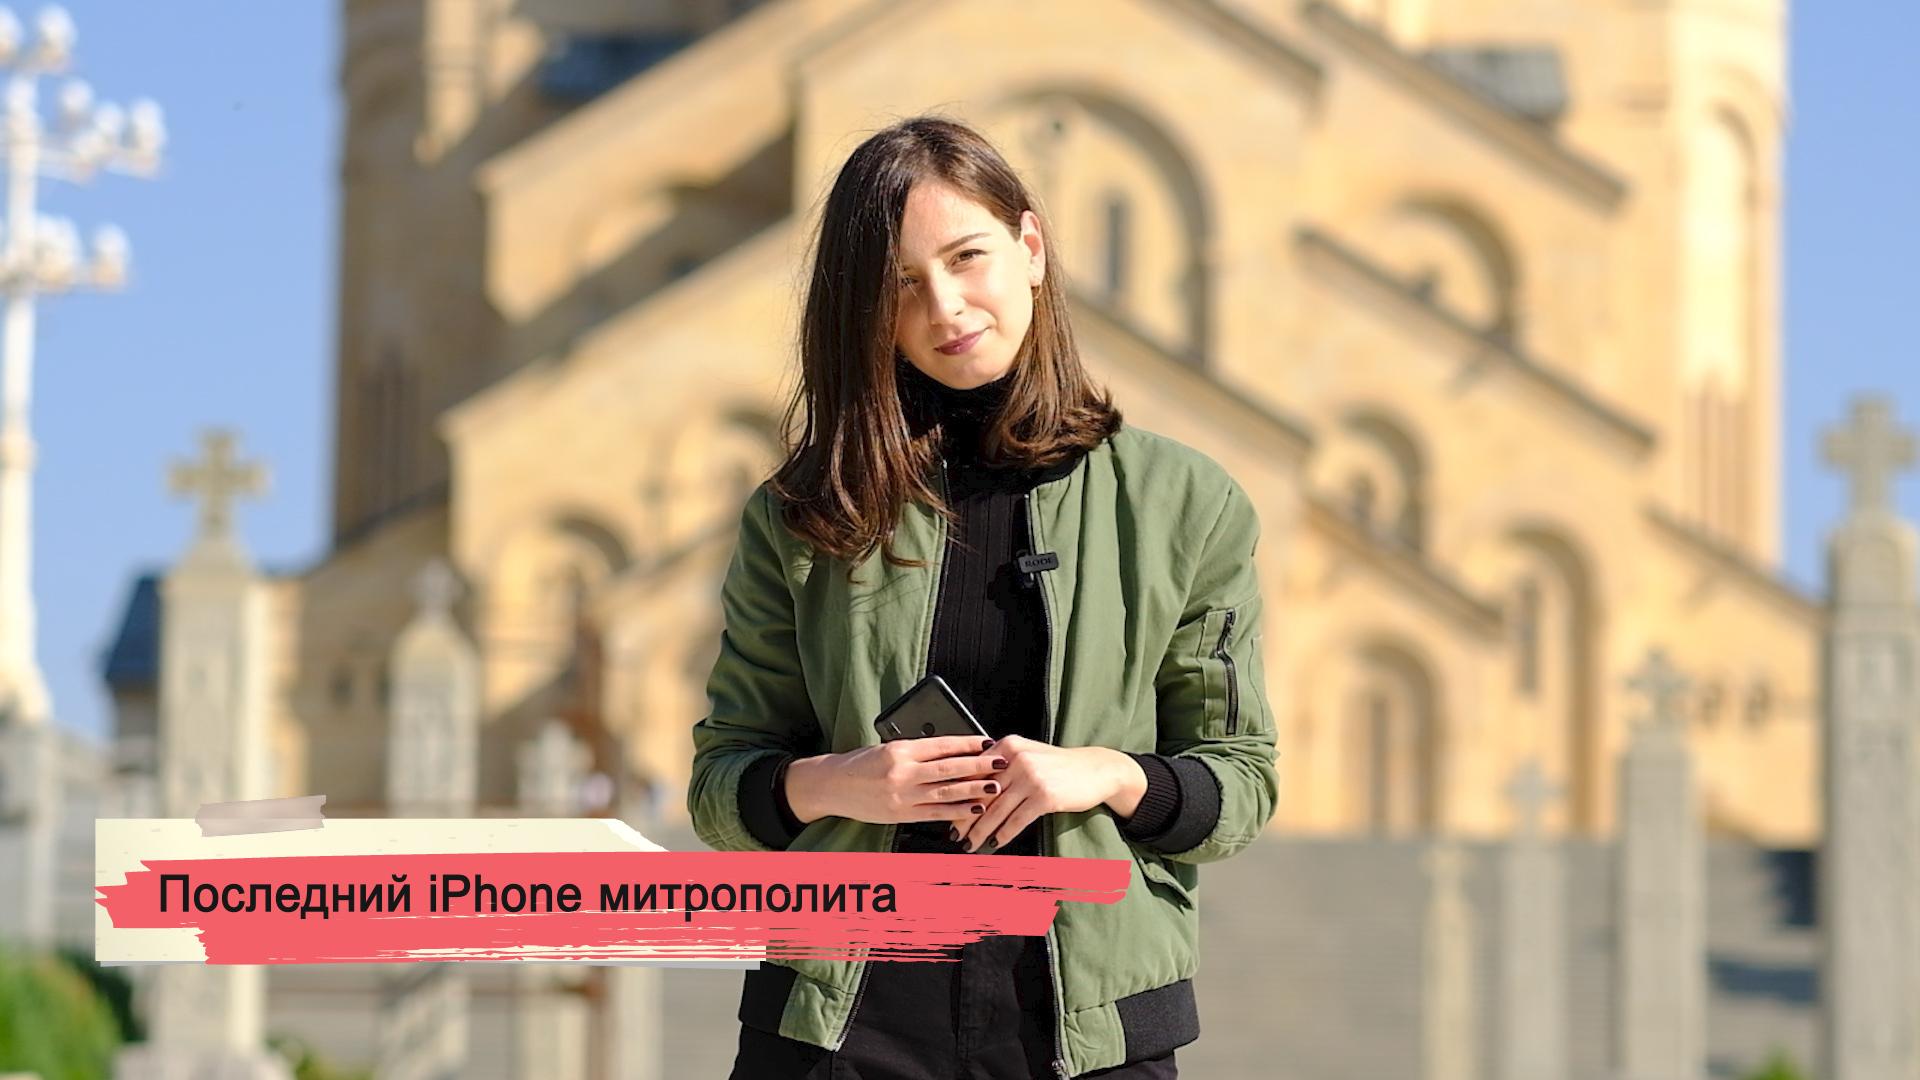 Последний iPhone митрополита